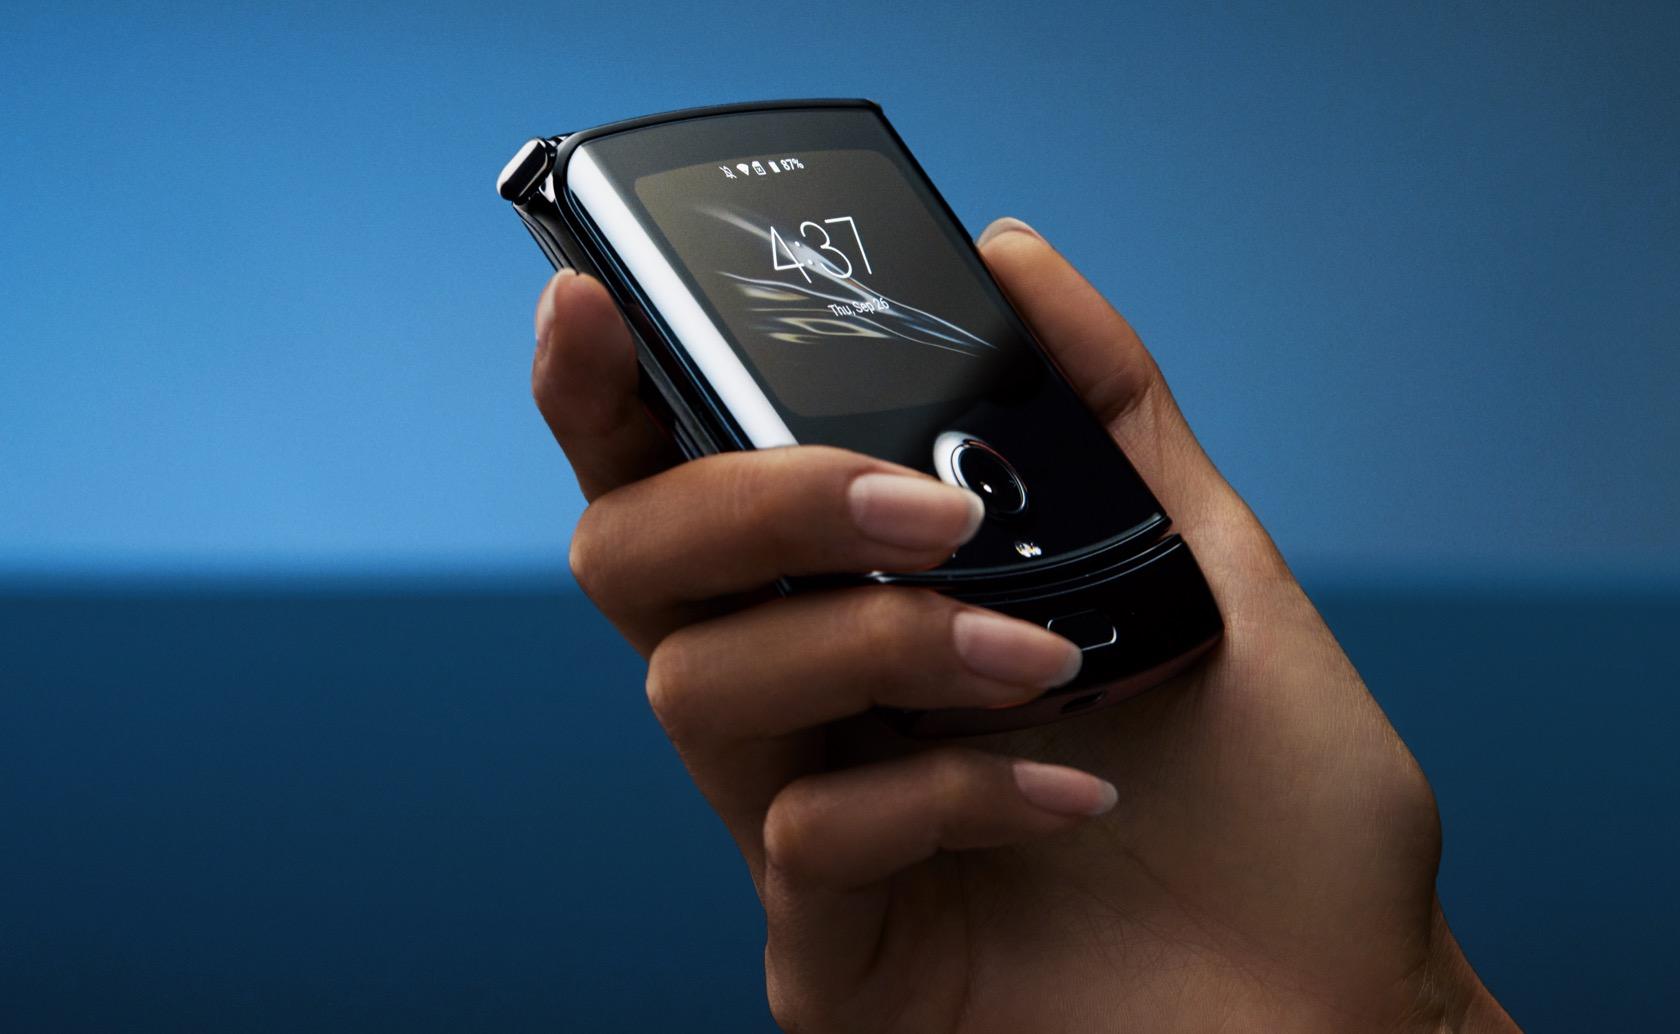 摩托罗拉Razr宣告重生 – 一台折叠屏Android手机的照片 - 3